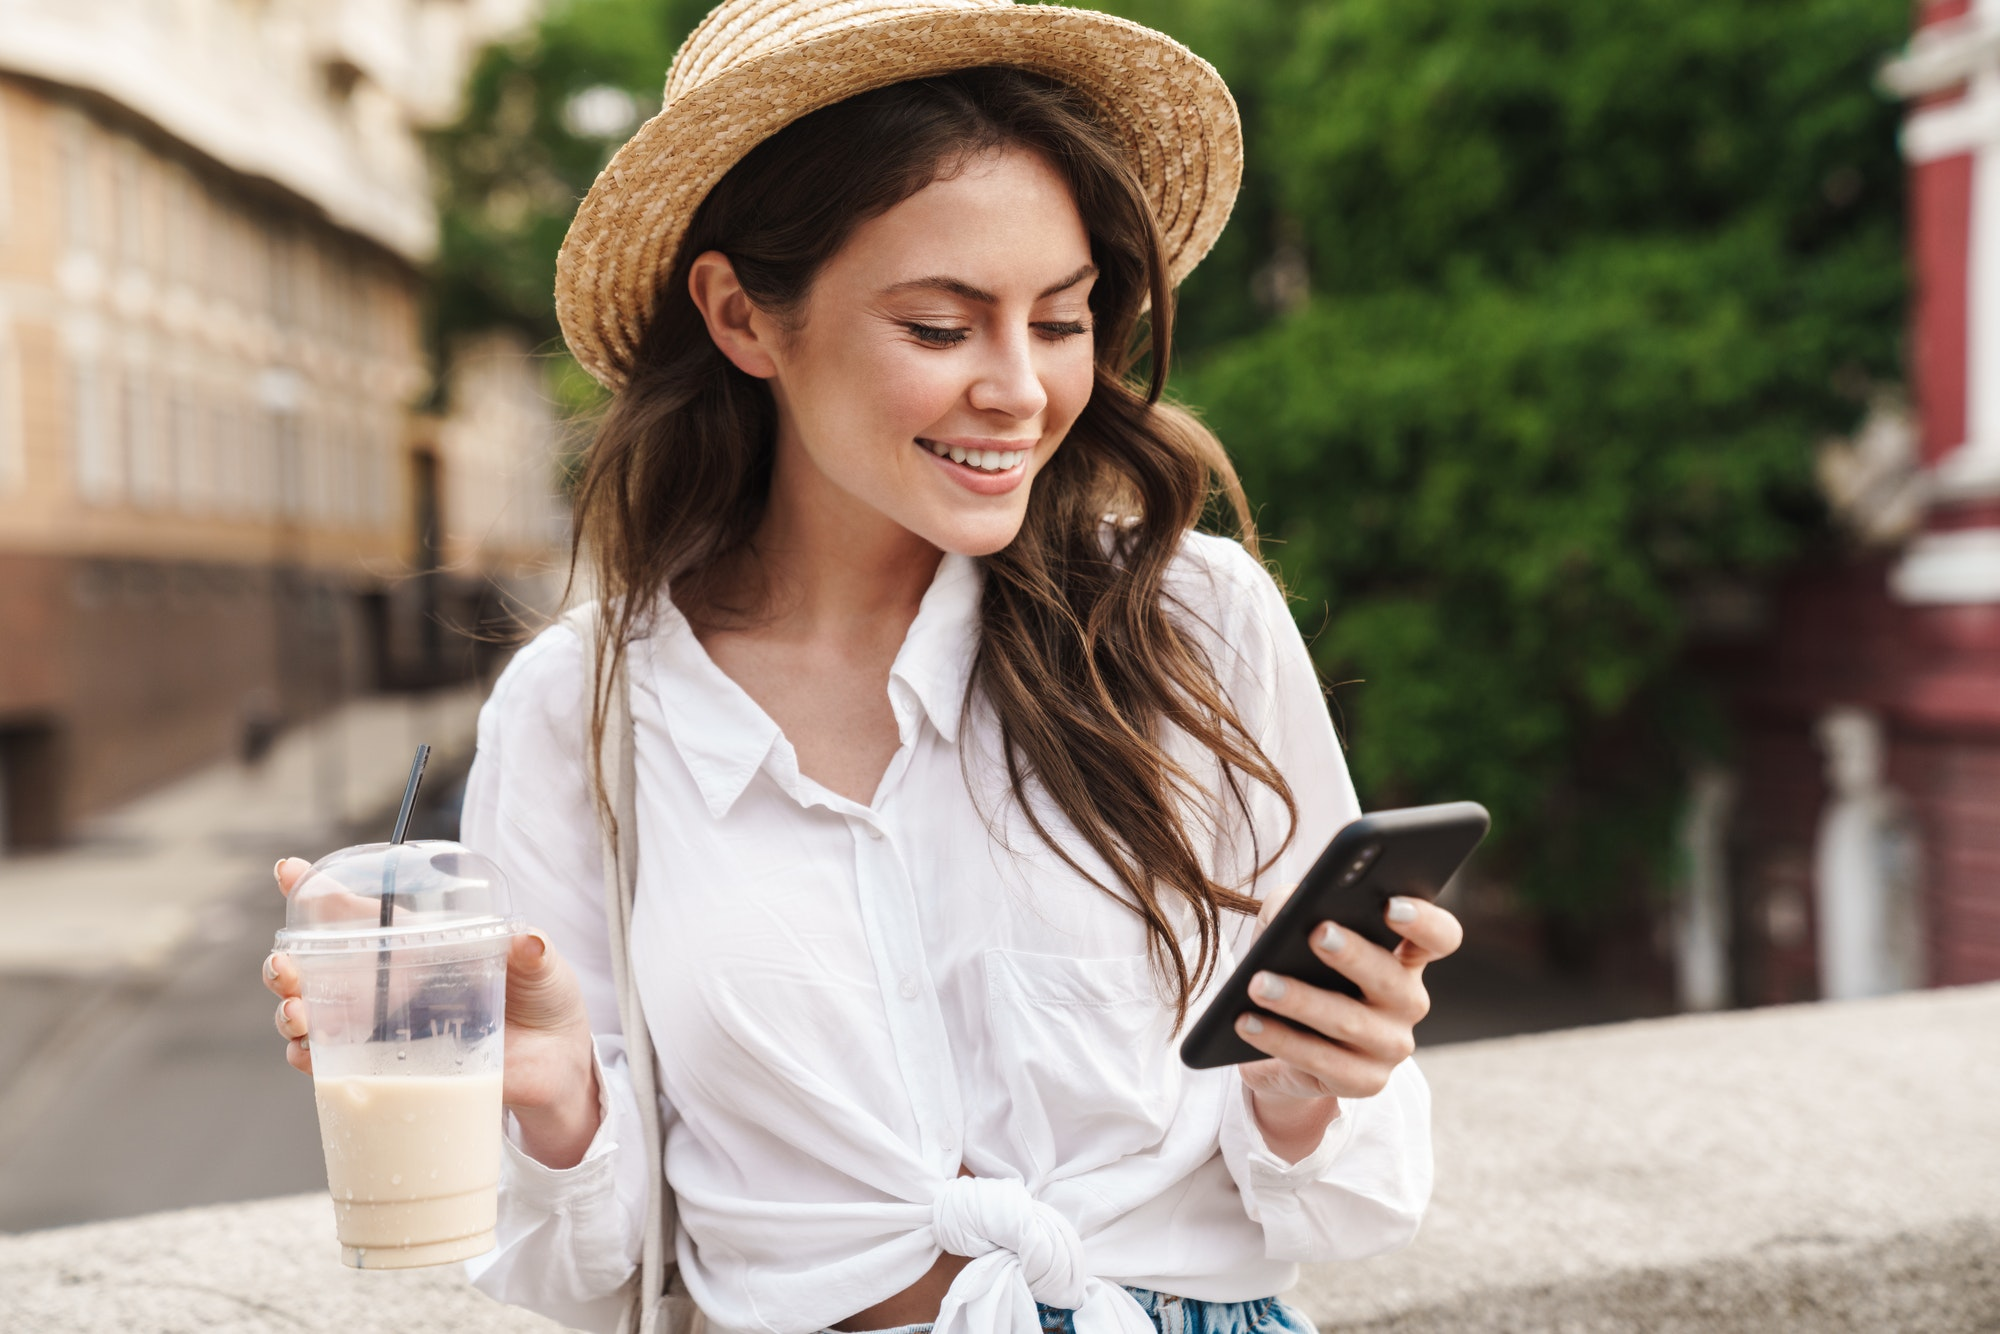 Portrait of young joyful woman using cellphone and drinking milkshake